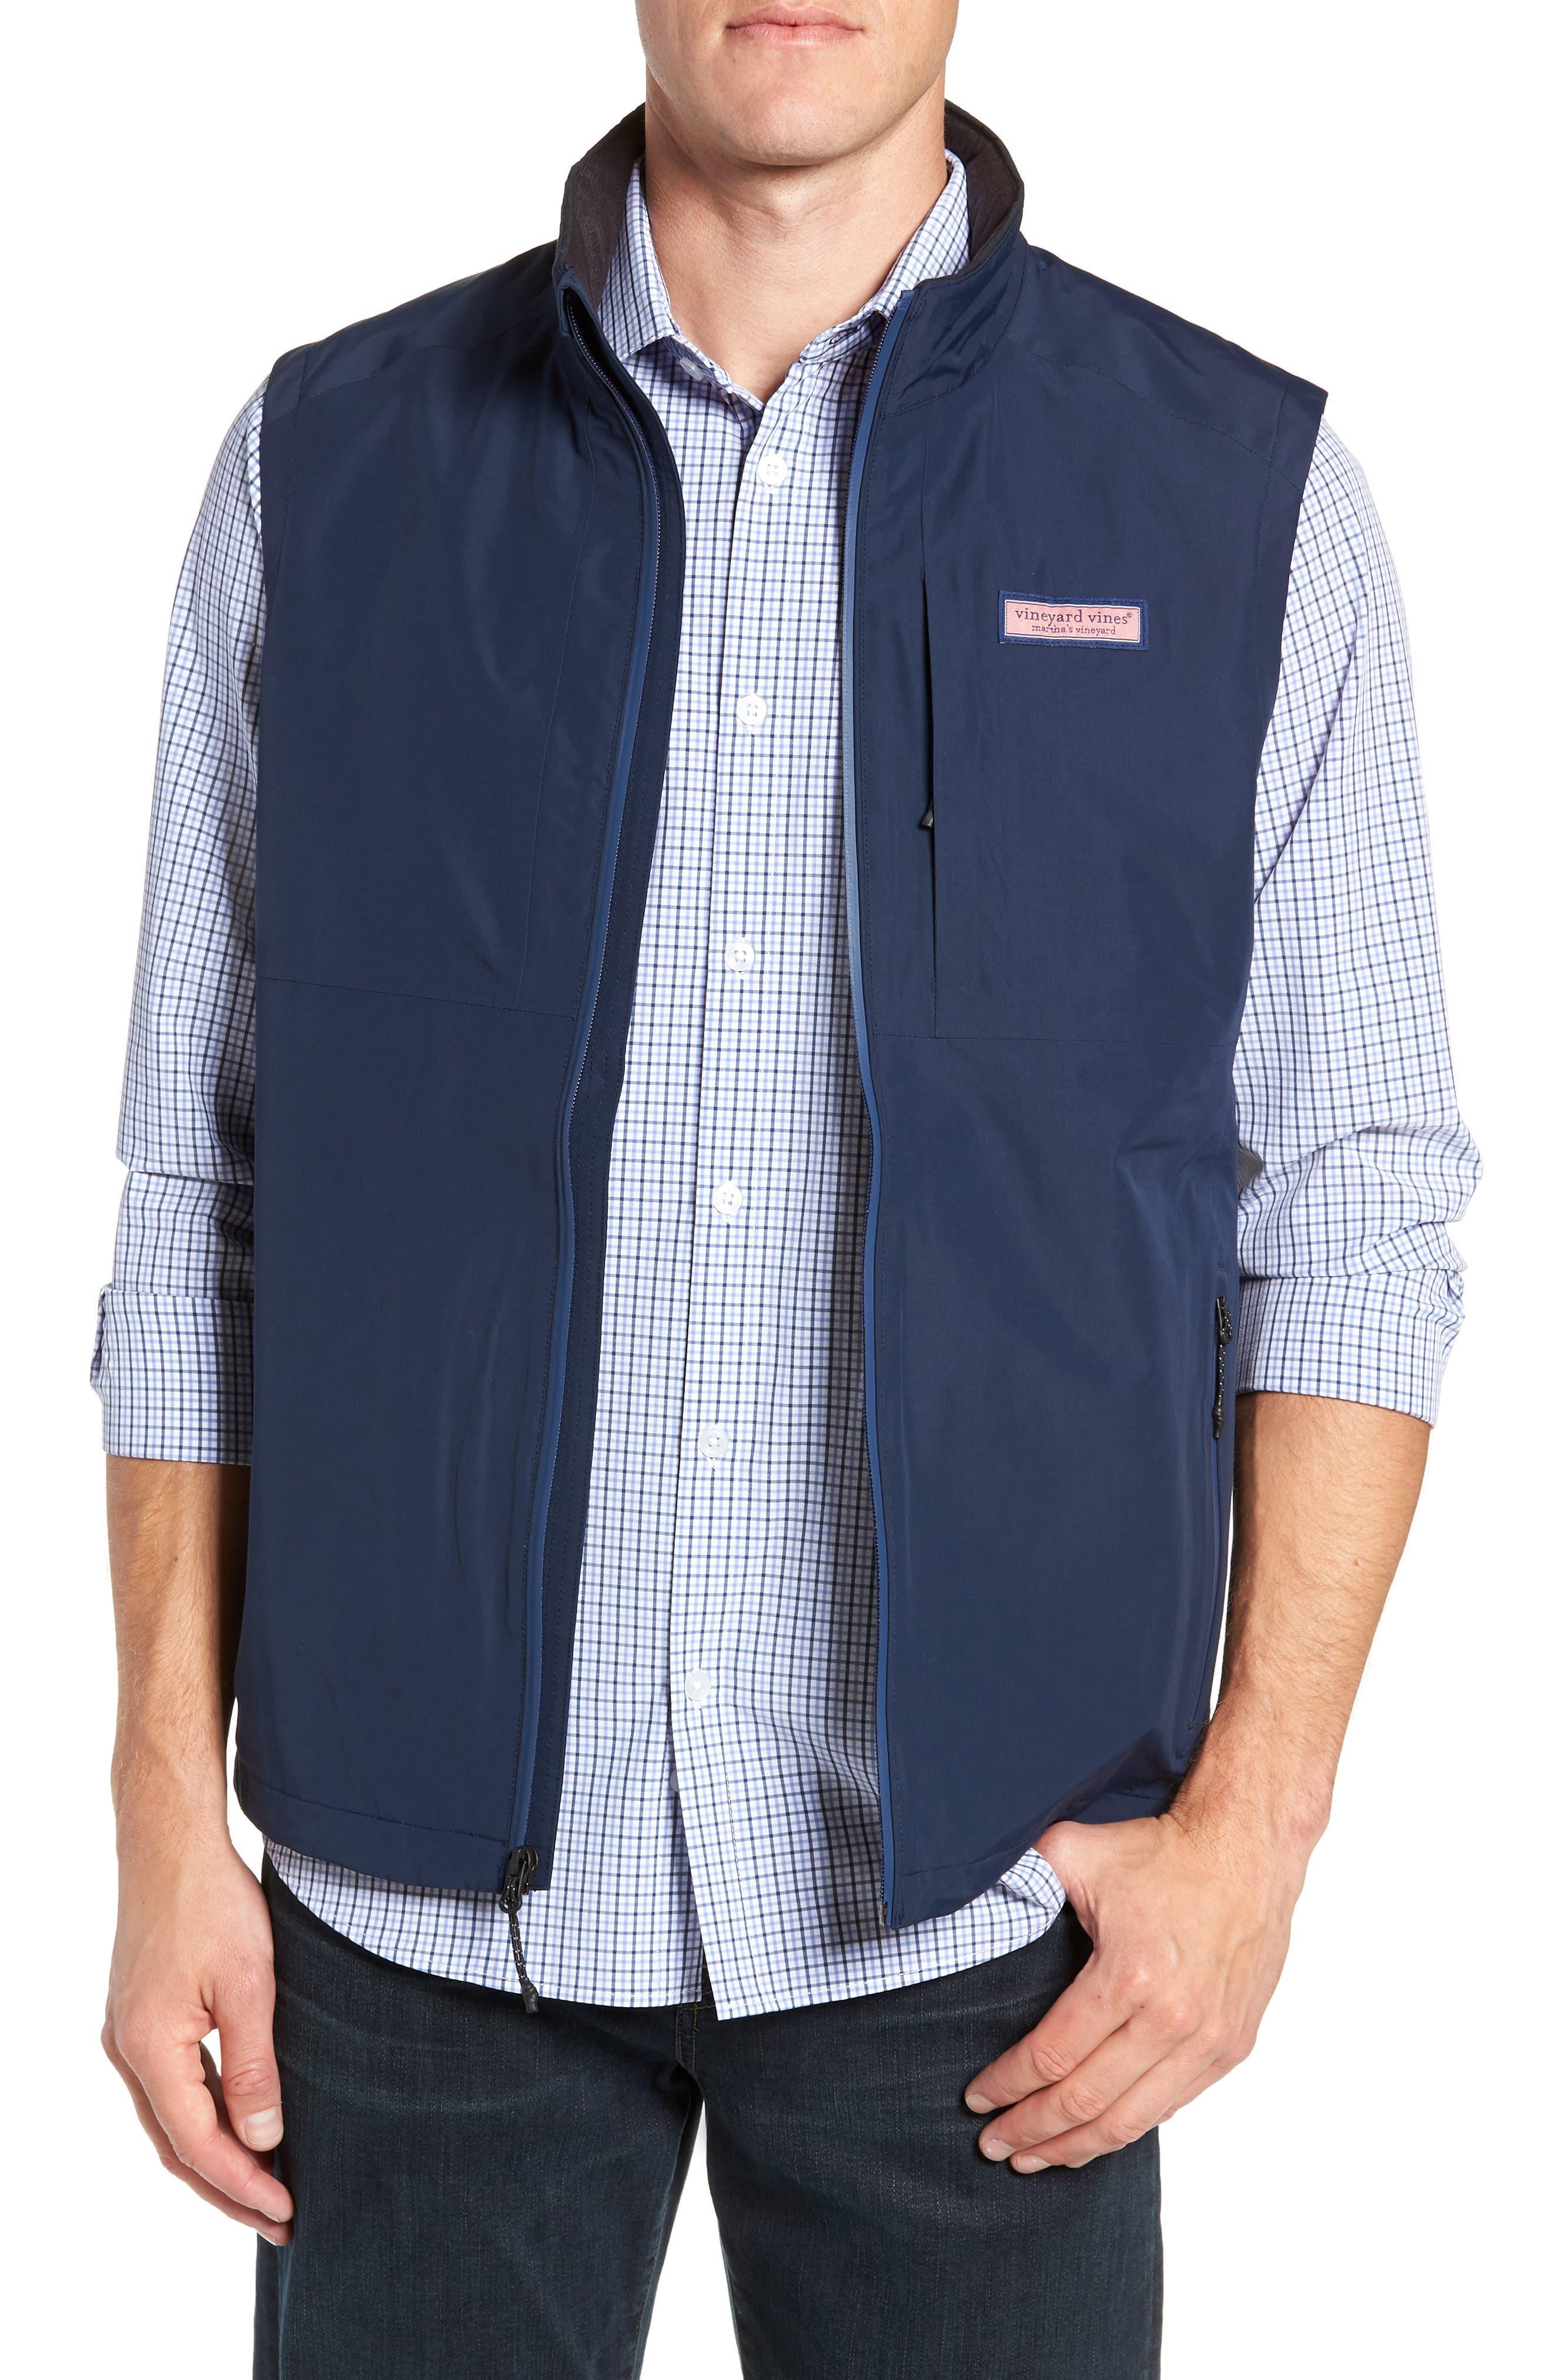 Tech Windbreaker Vest,                             Main thumbnail 1, color,                             410